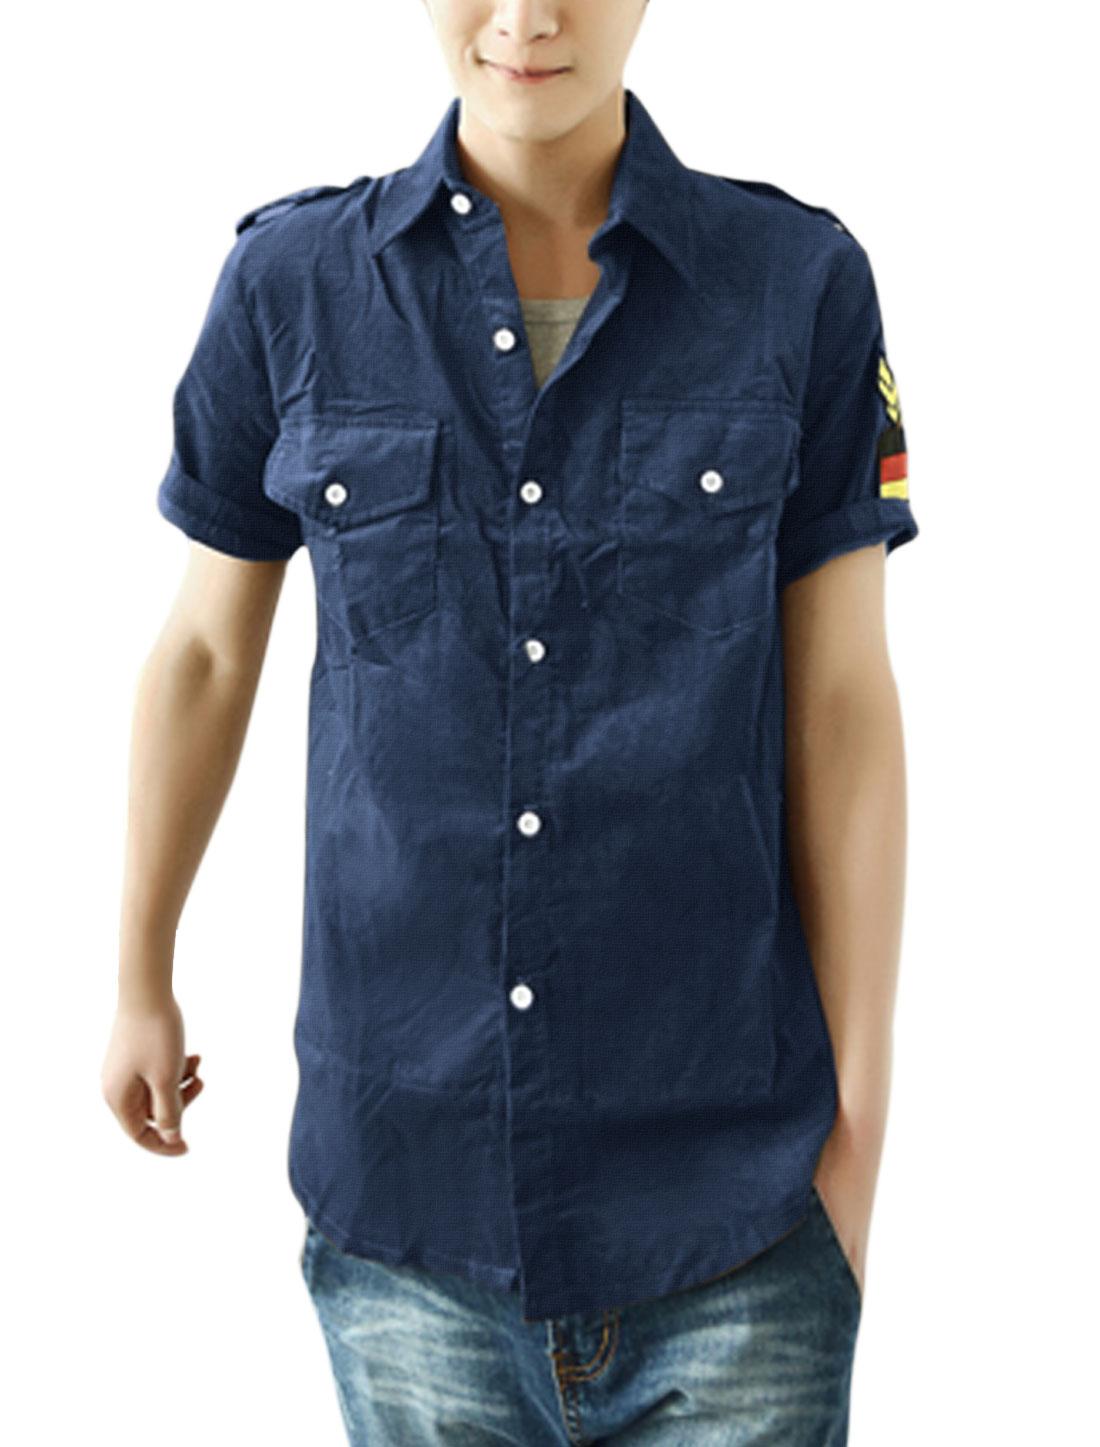 Men Stylish Short Sleeve Button-Front Epaulette Decor Shirt Navy Blue M